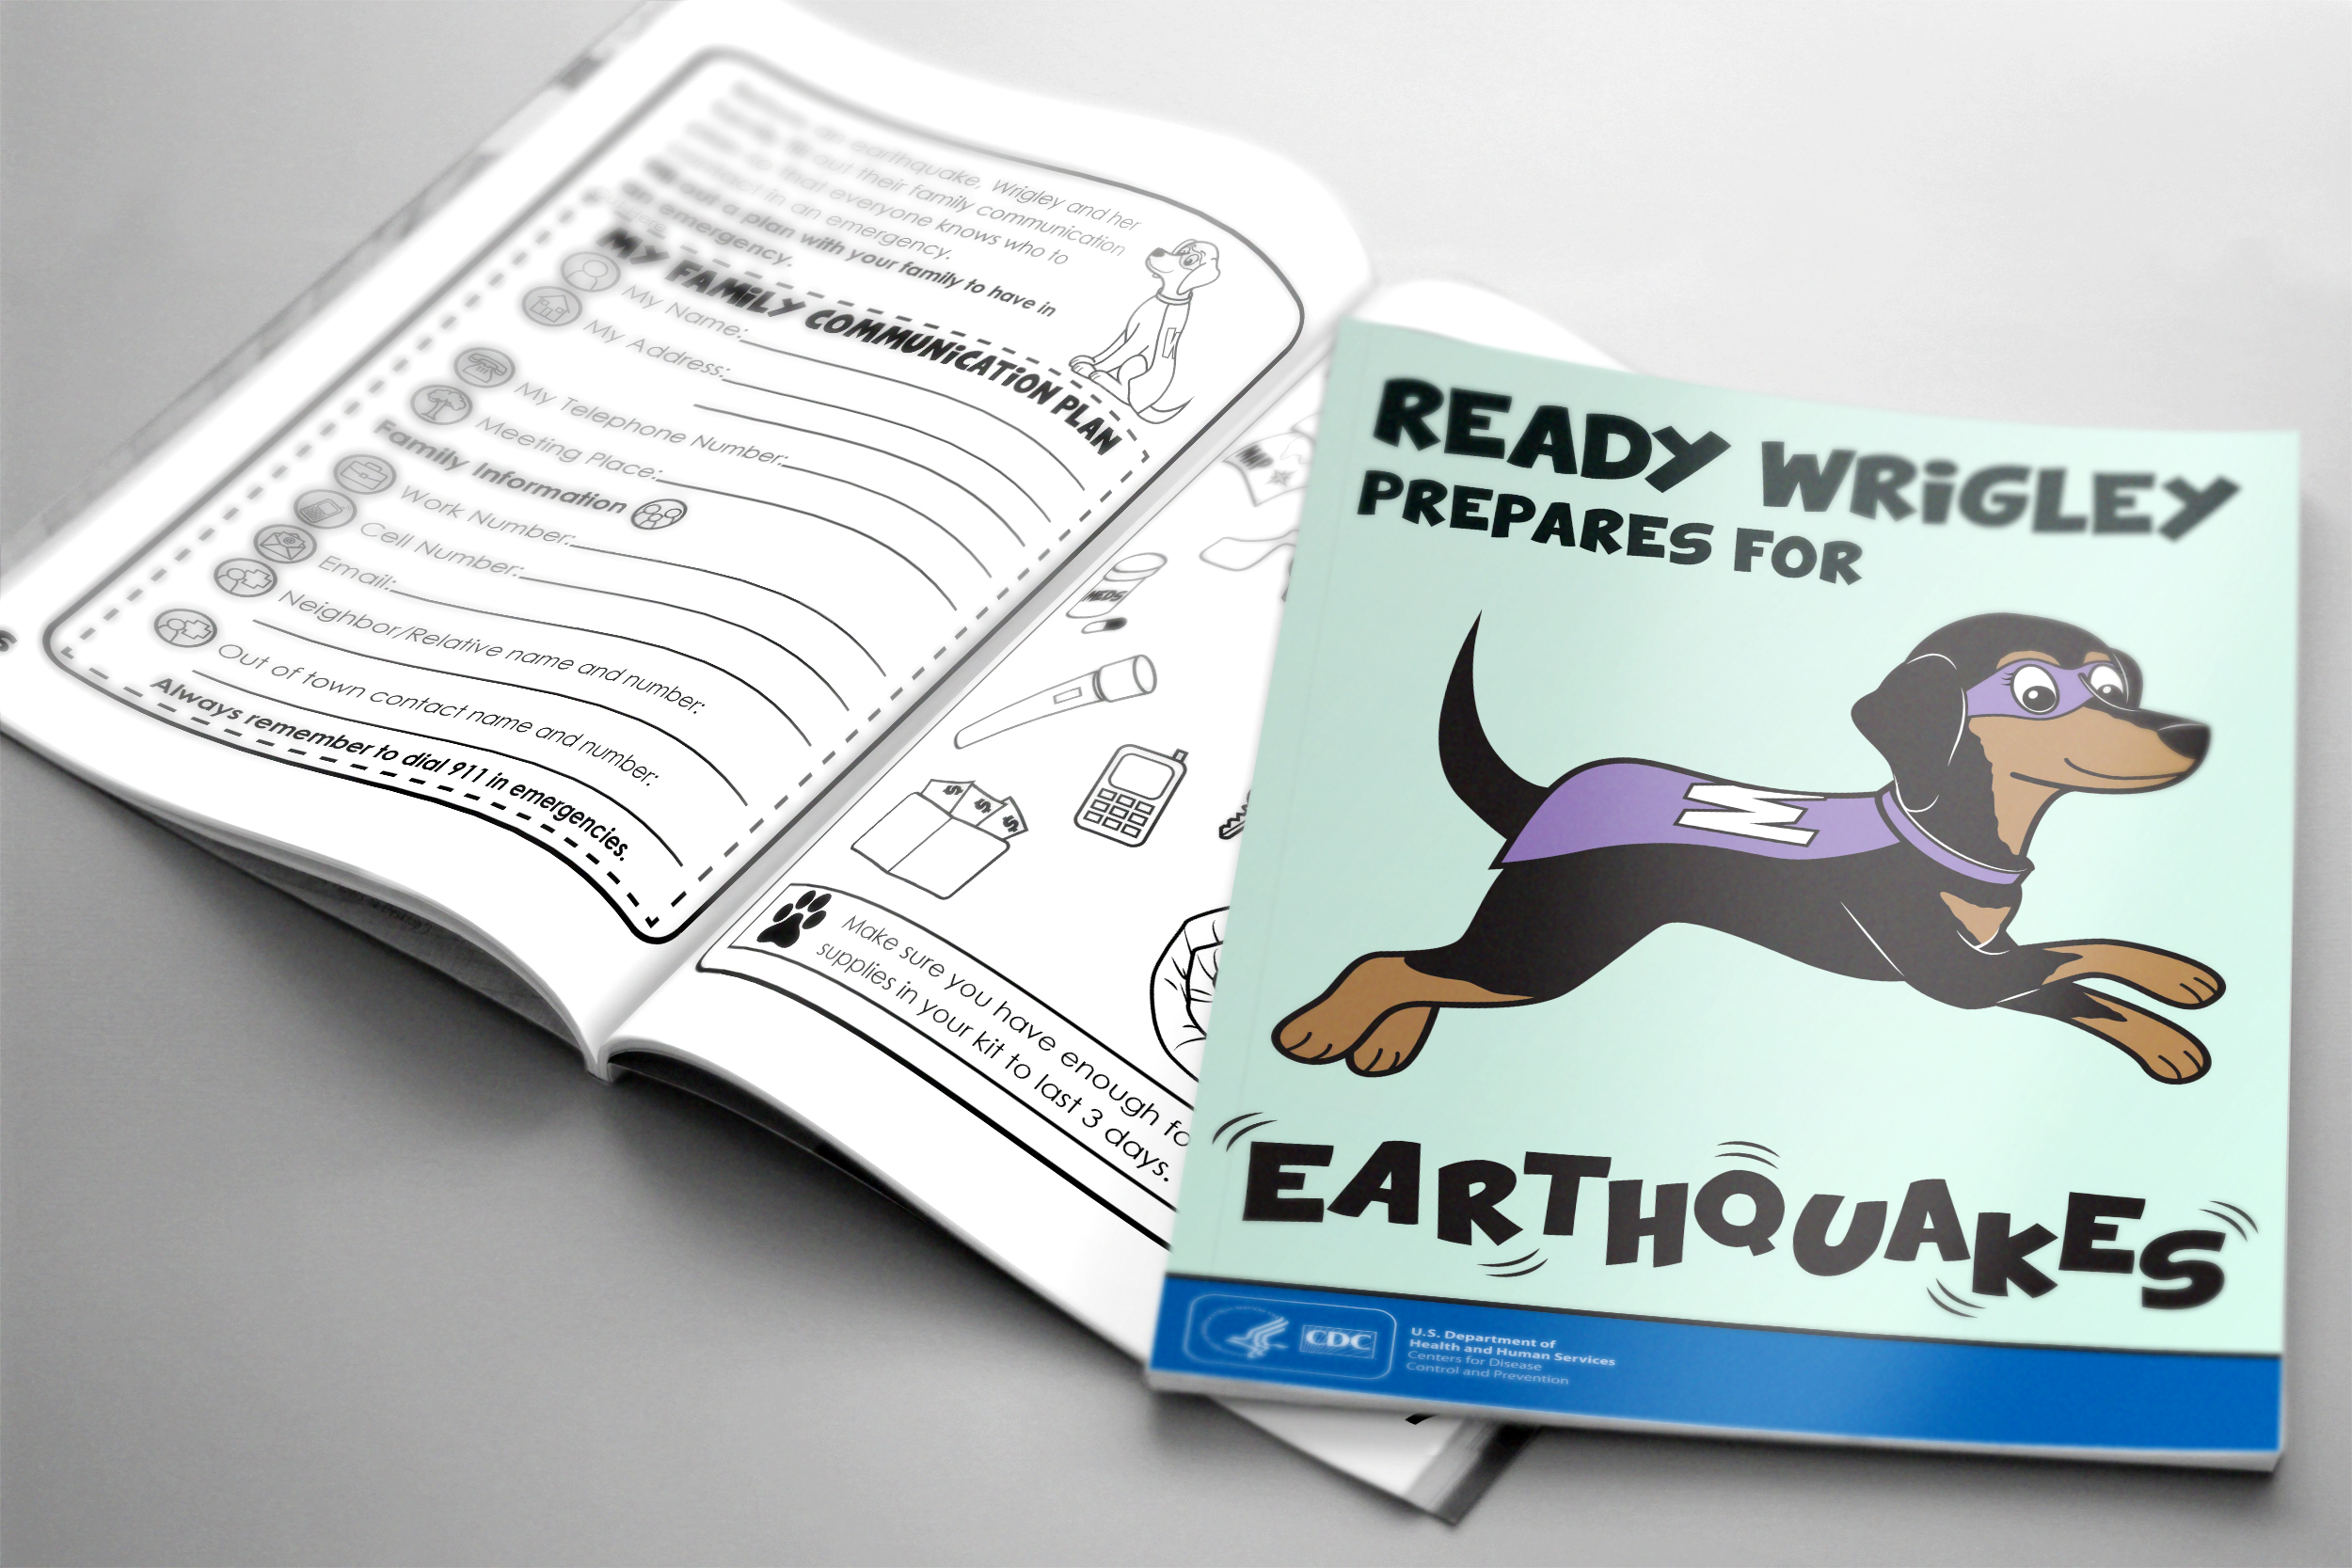 Ready Wrigley Prepares for Earthquakes